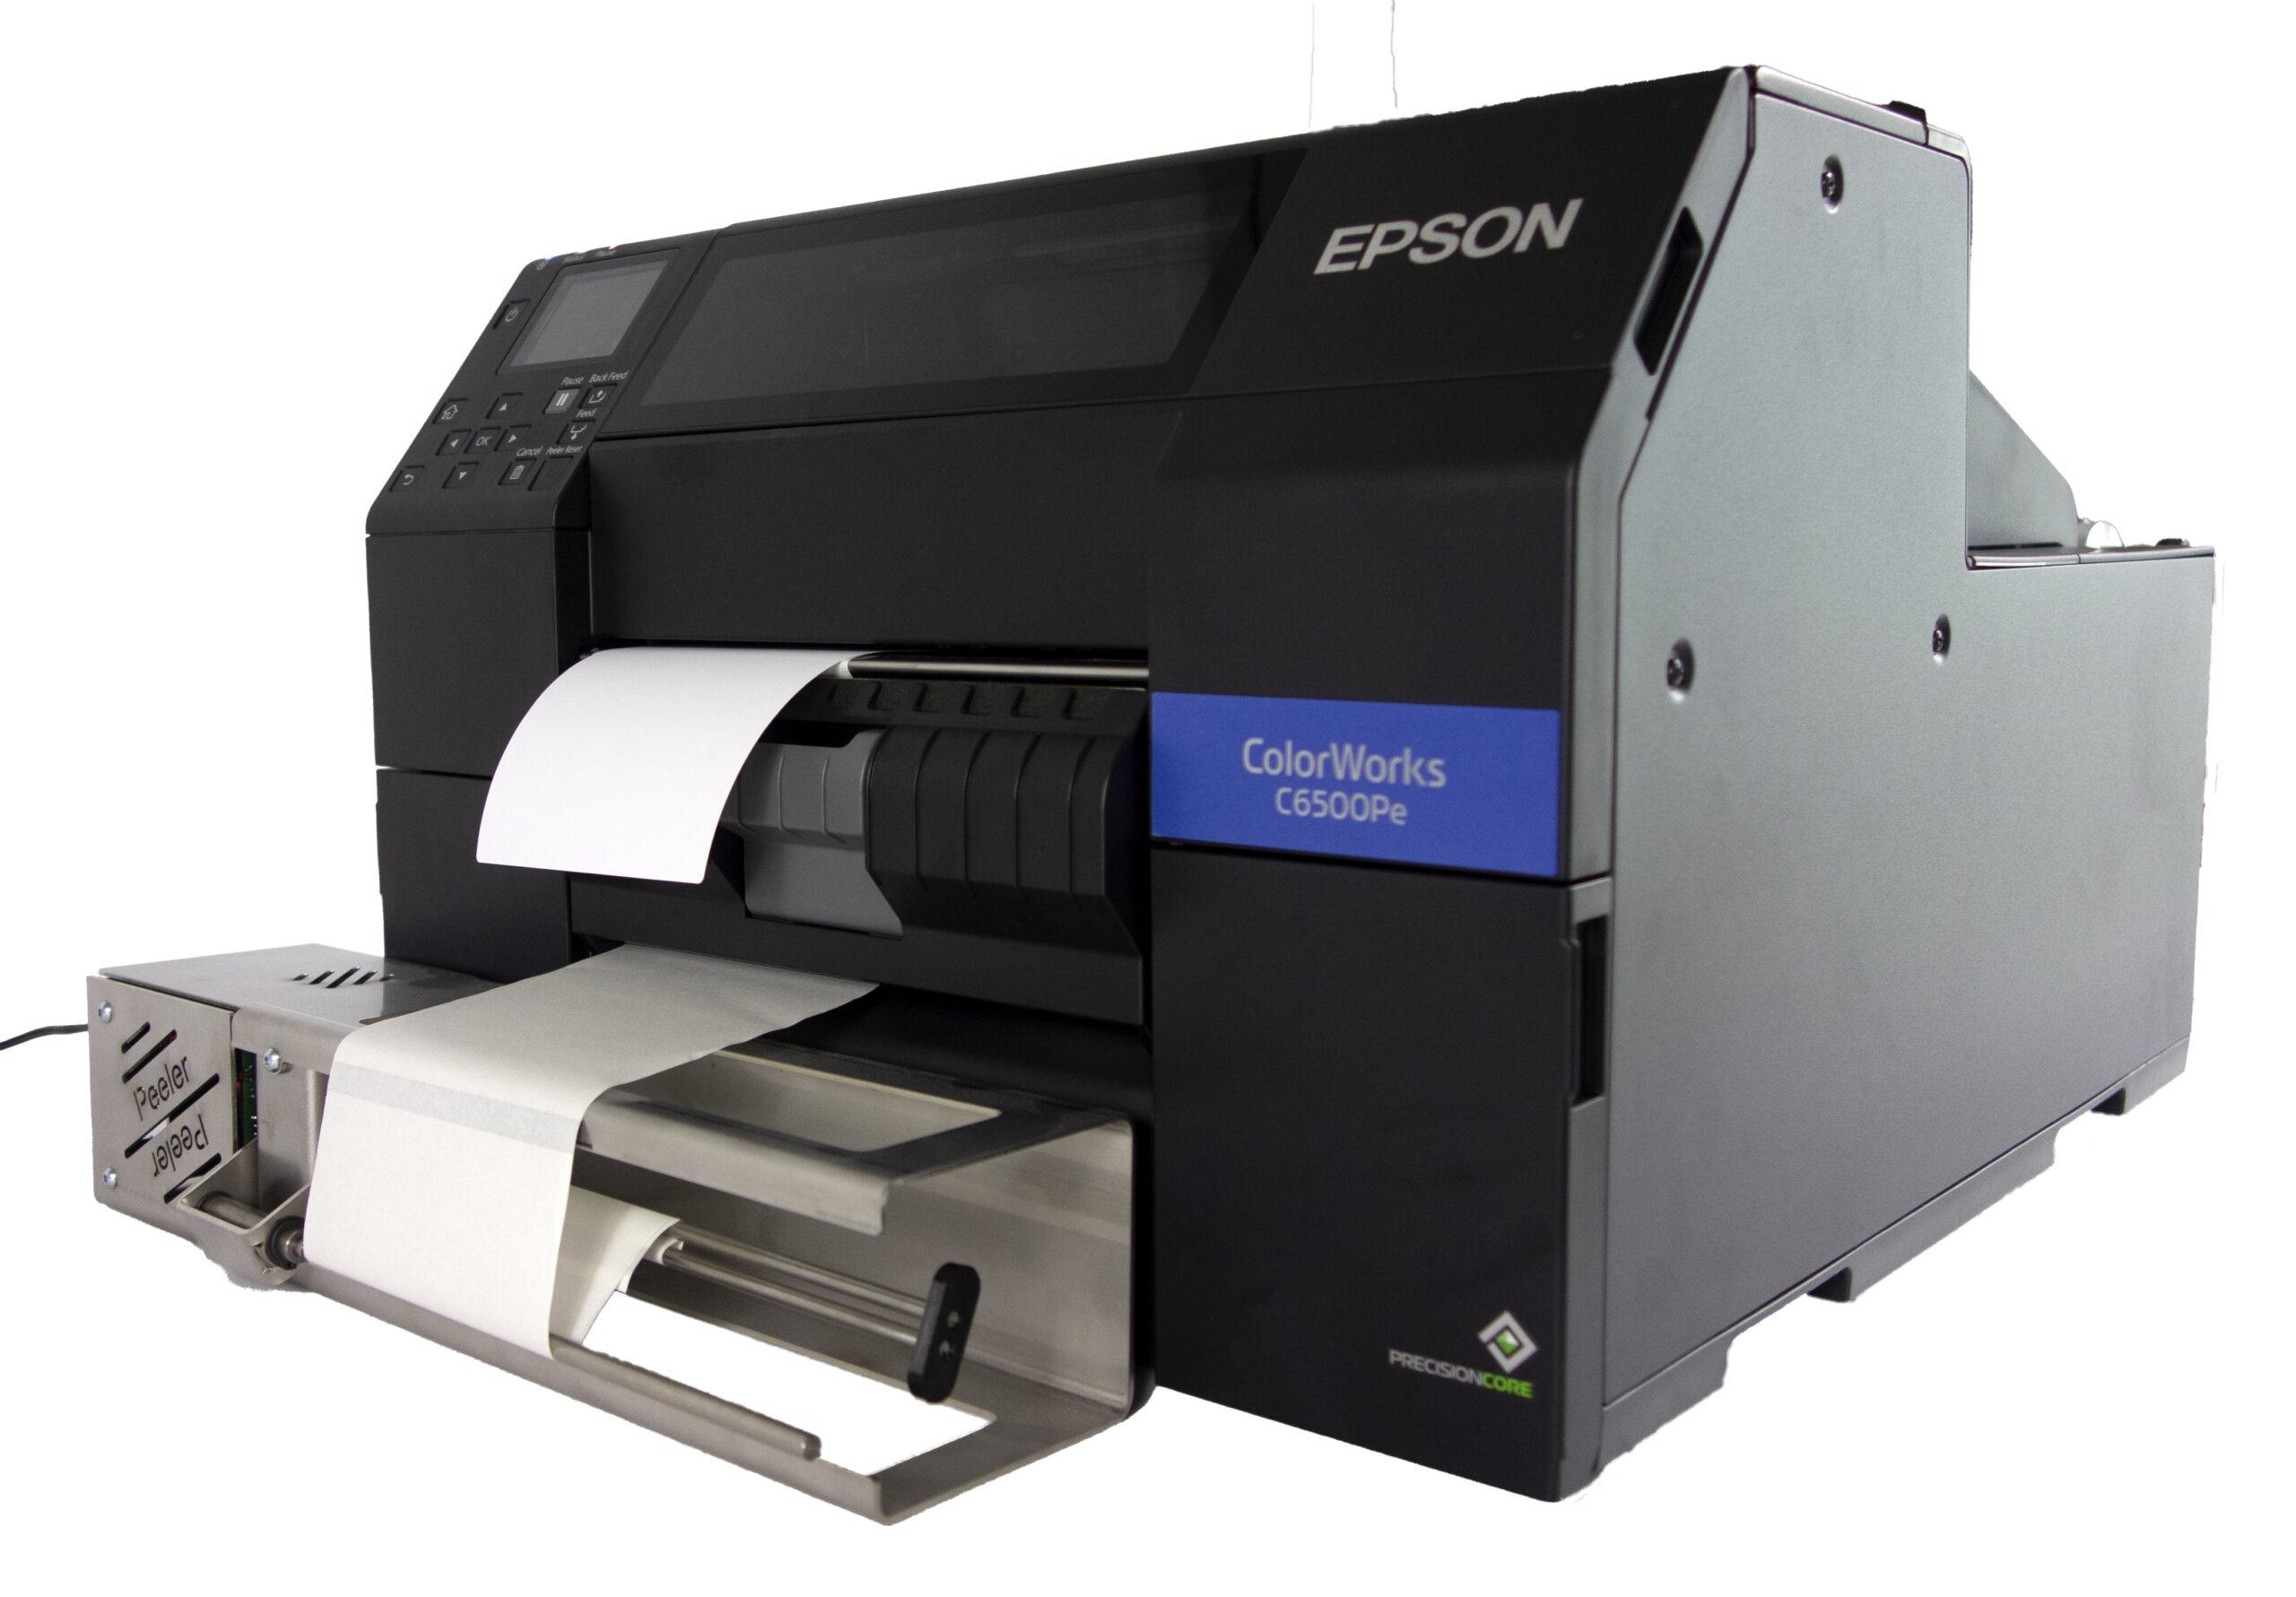 Peel-off Rewinder for Epson C6500 series